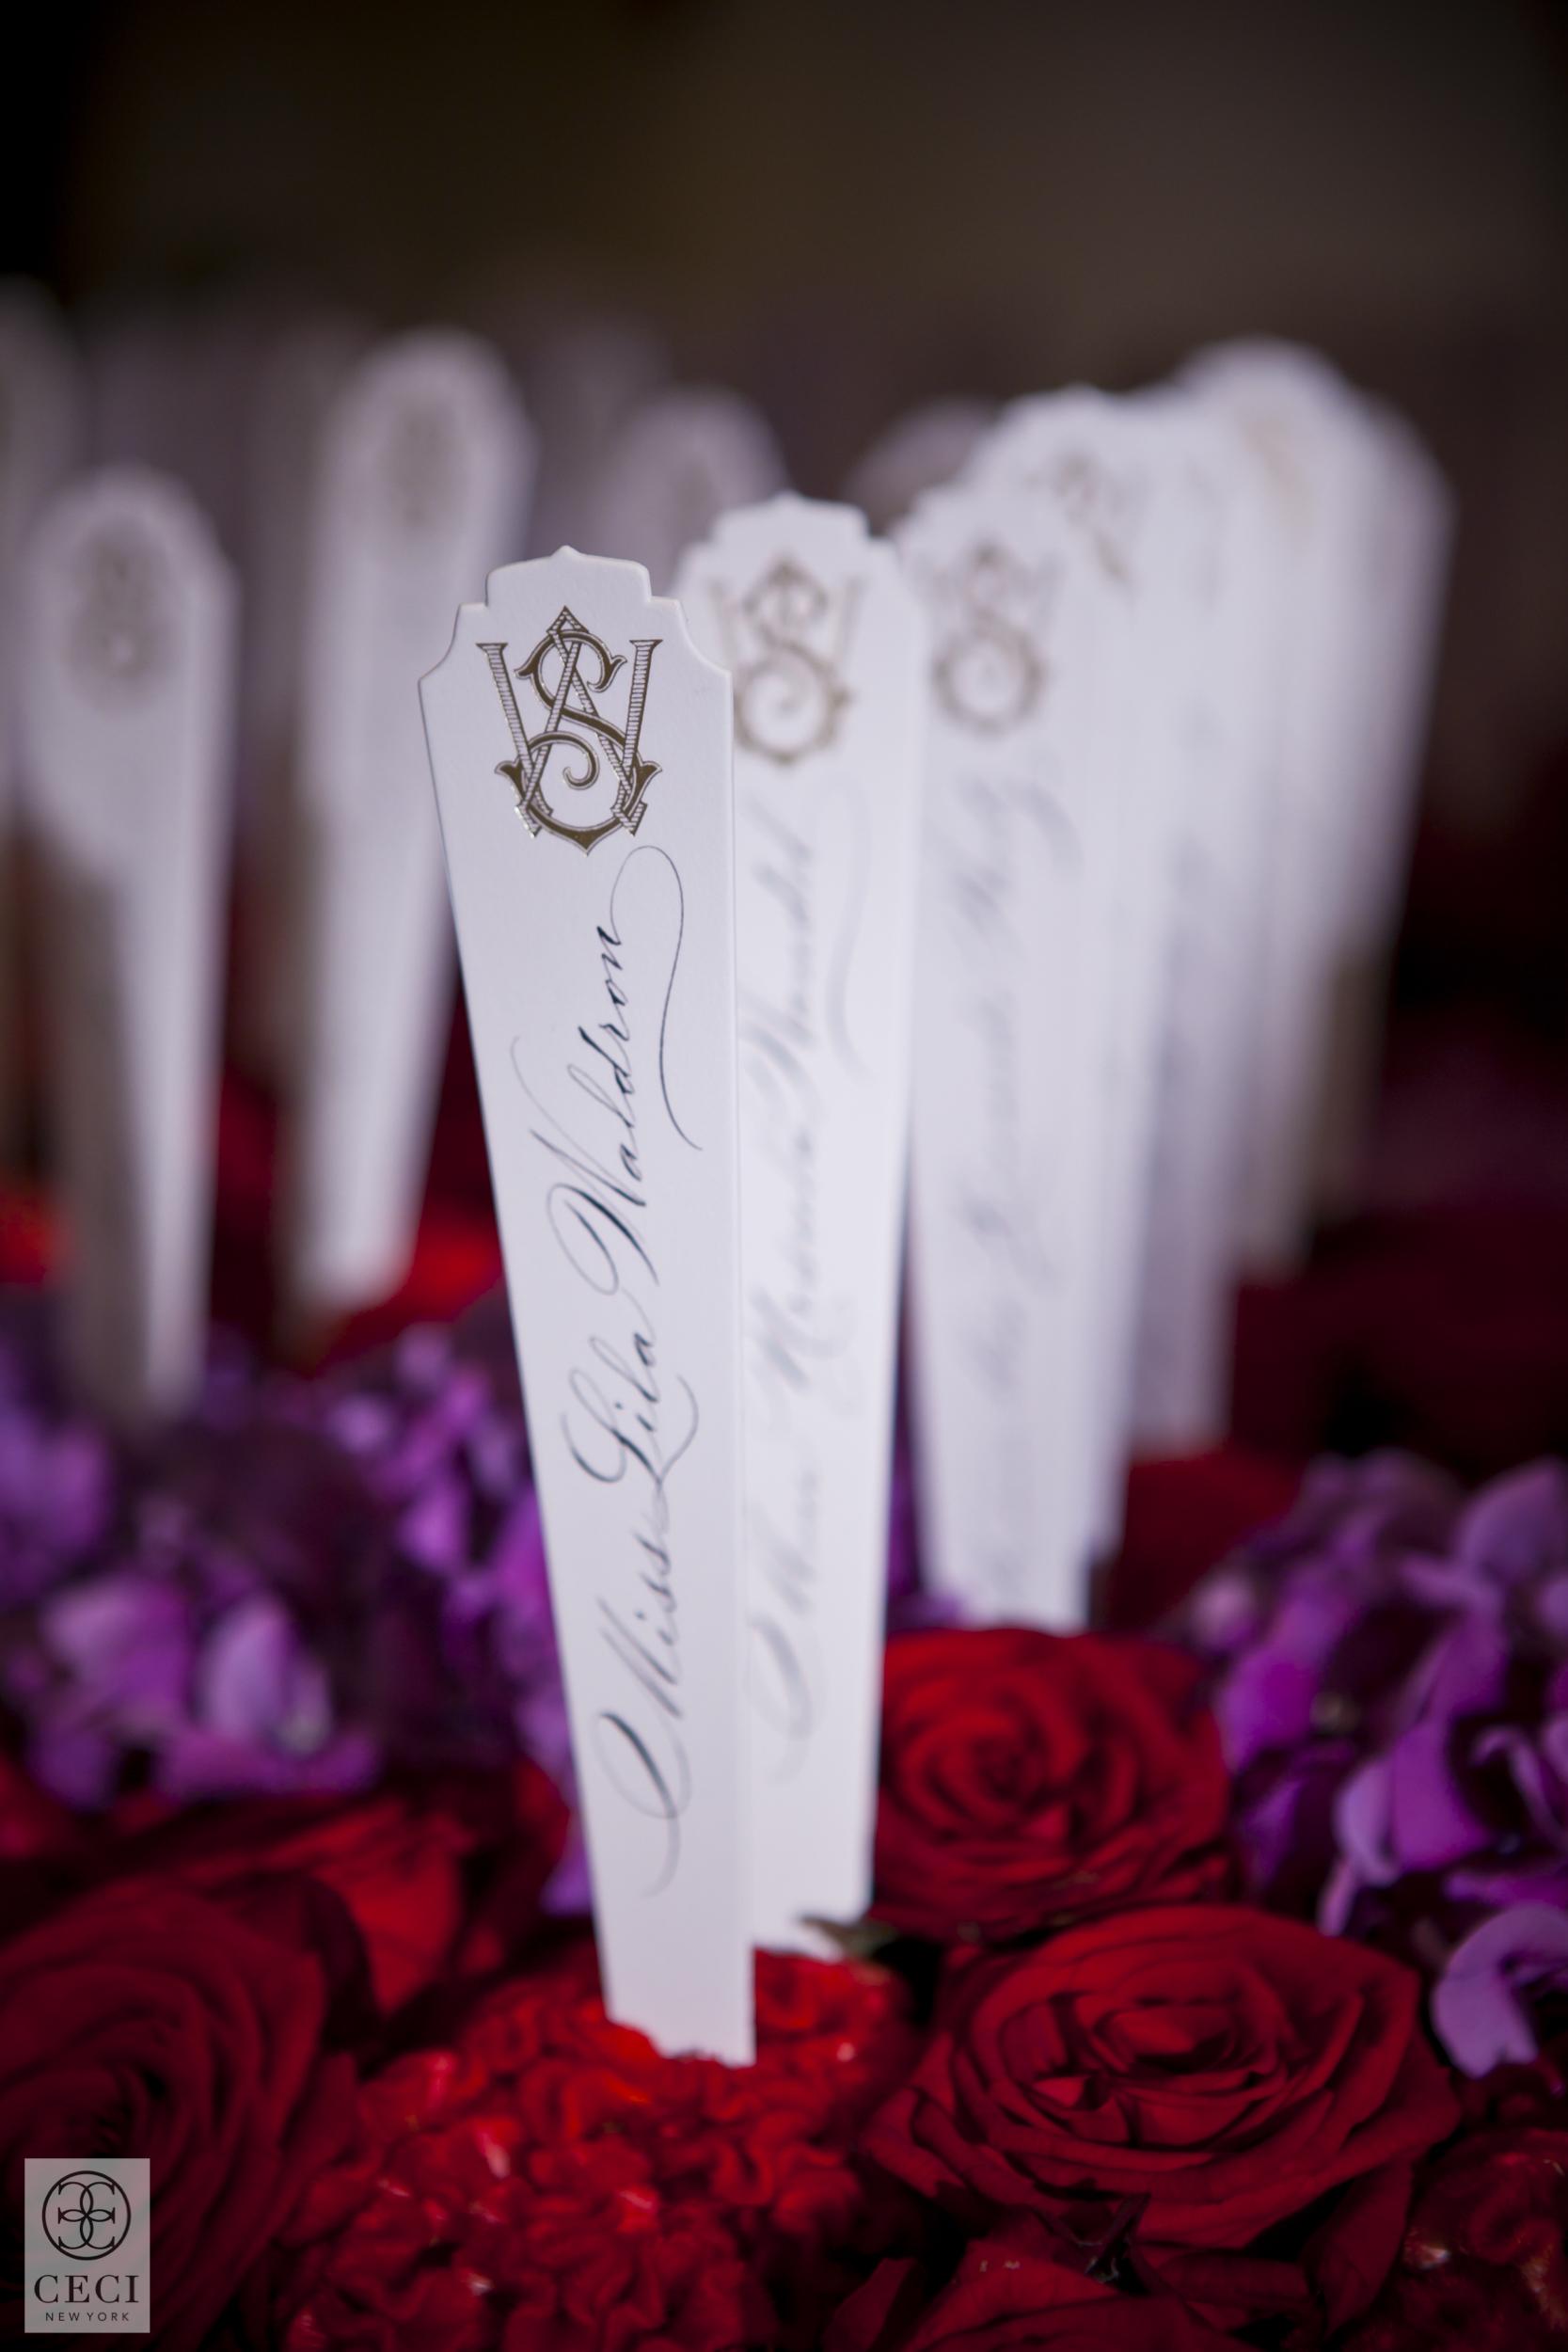 ceci_new_york_lucas_somoza_purple_regal_wediding_birthday_commitment_ceremony_invitation_logo_branding_perfume_gold_-3.jpg